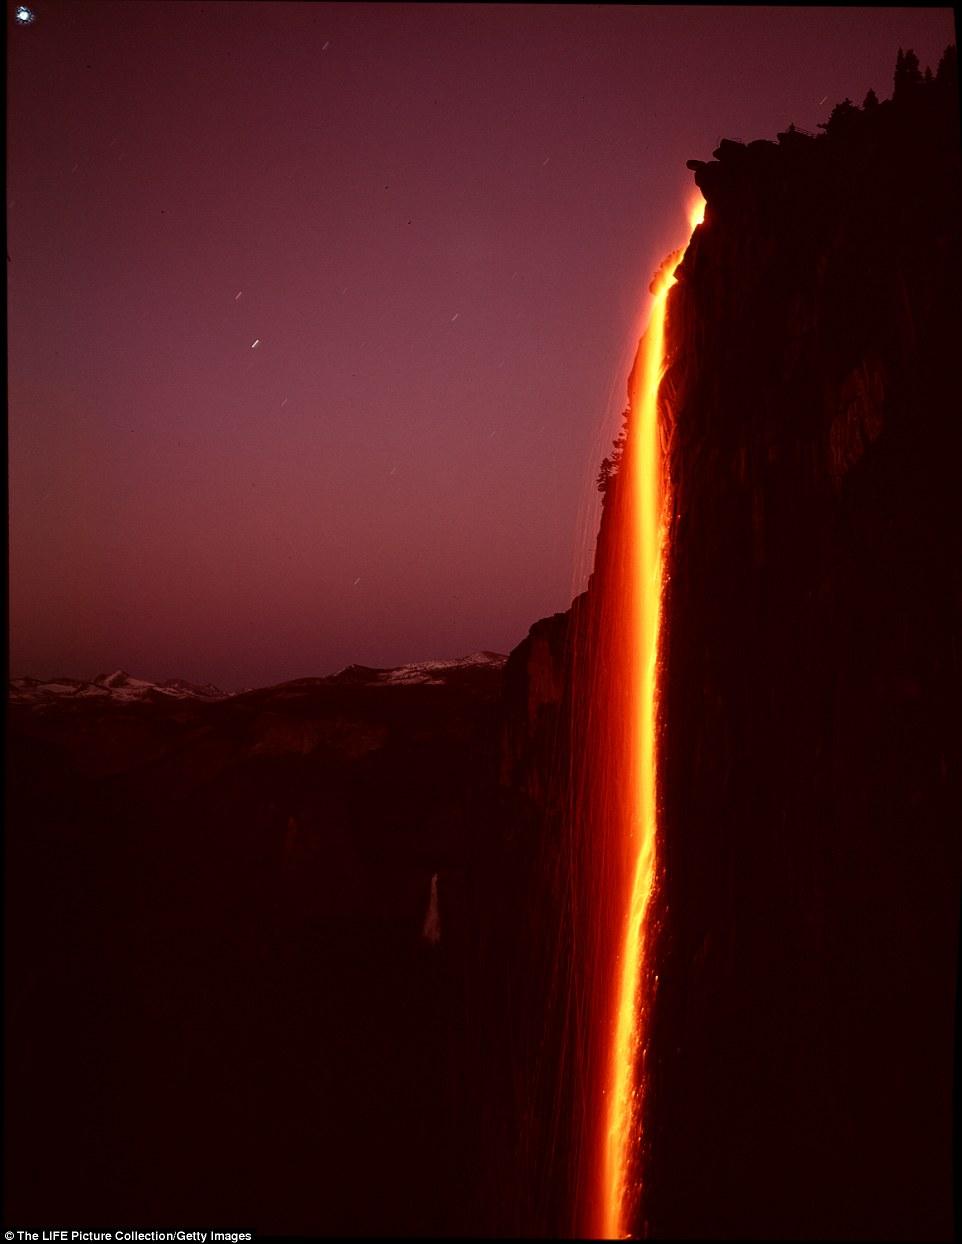 Fall Waterfall Wallpaper Yosemite National Park S Stunning Firefall Daily Mail